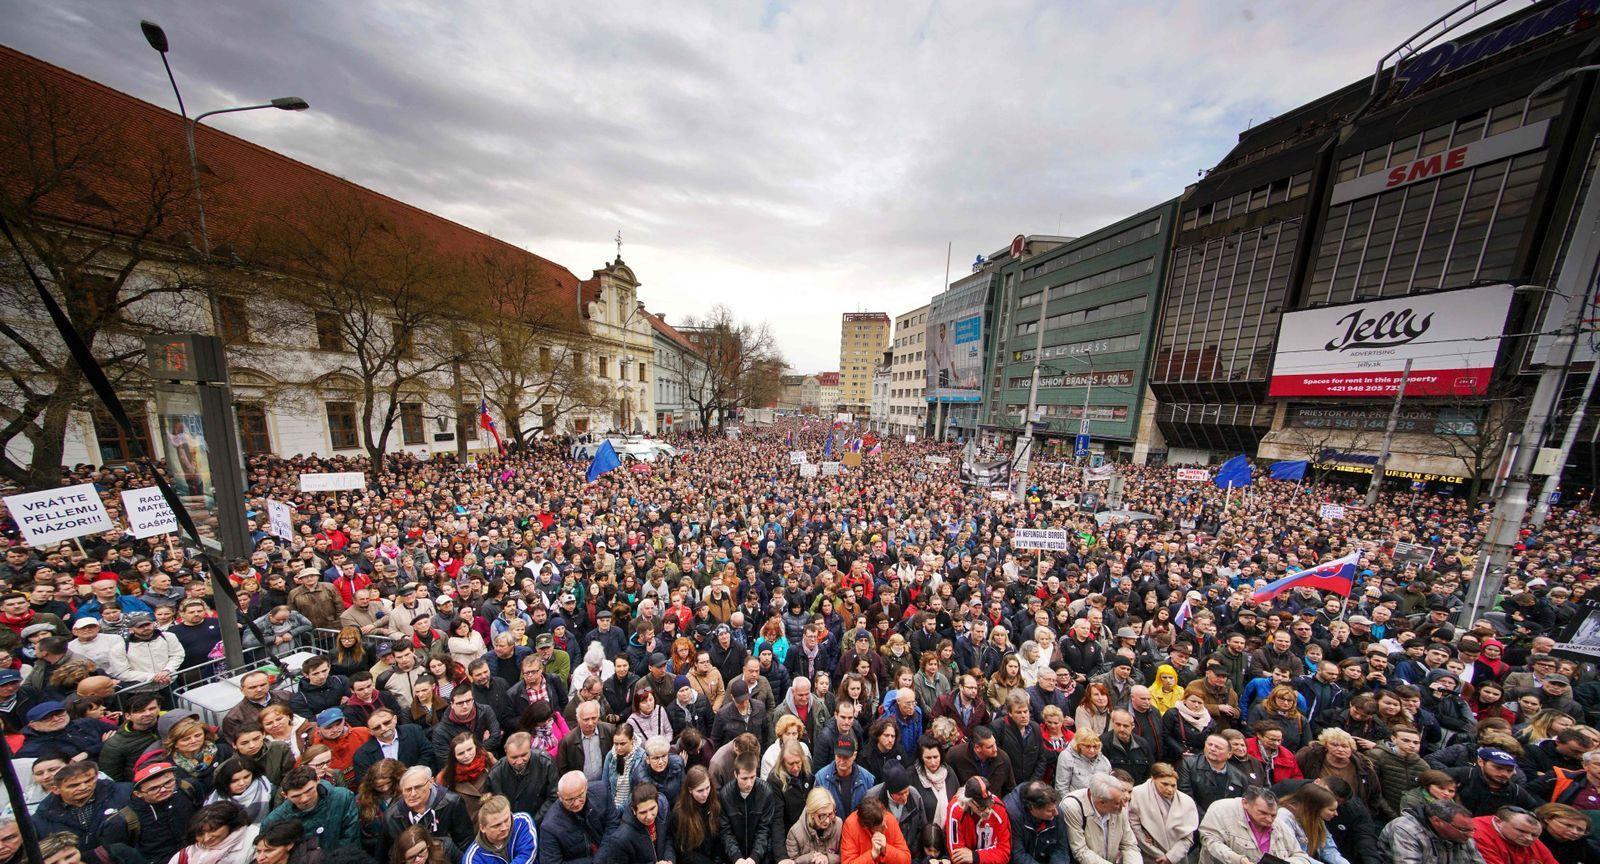 SLOVAKIA-POLITICS-PROTEST